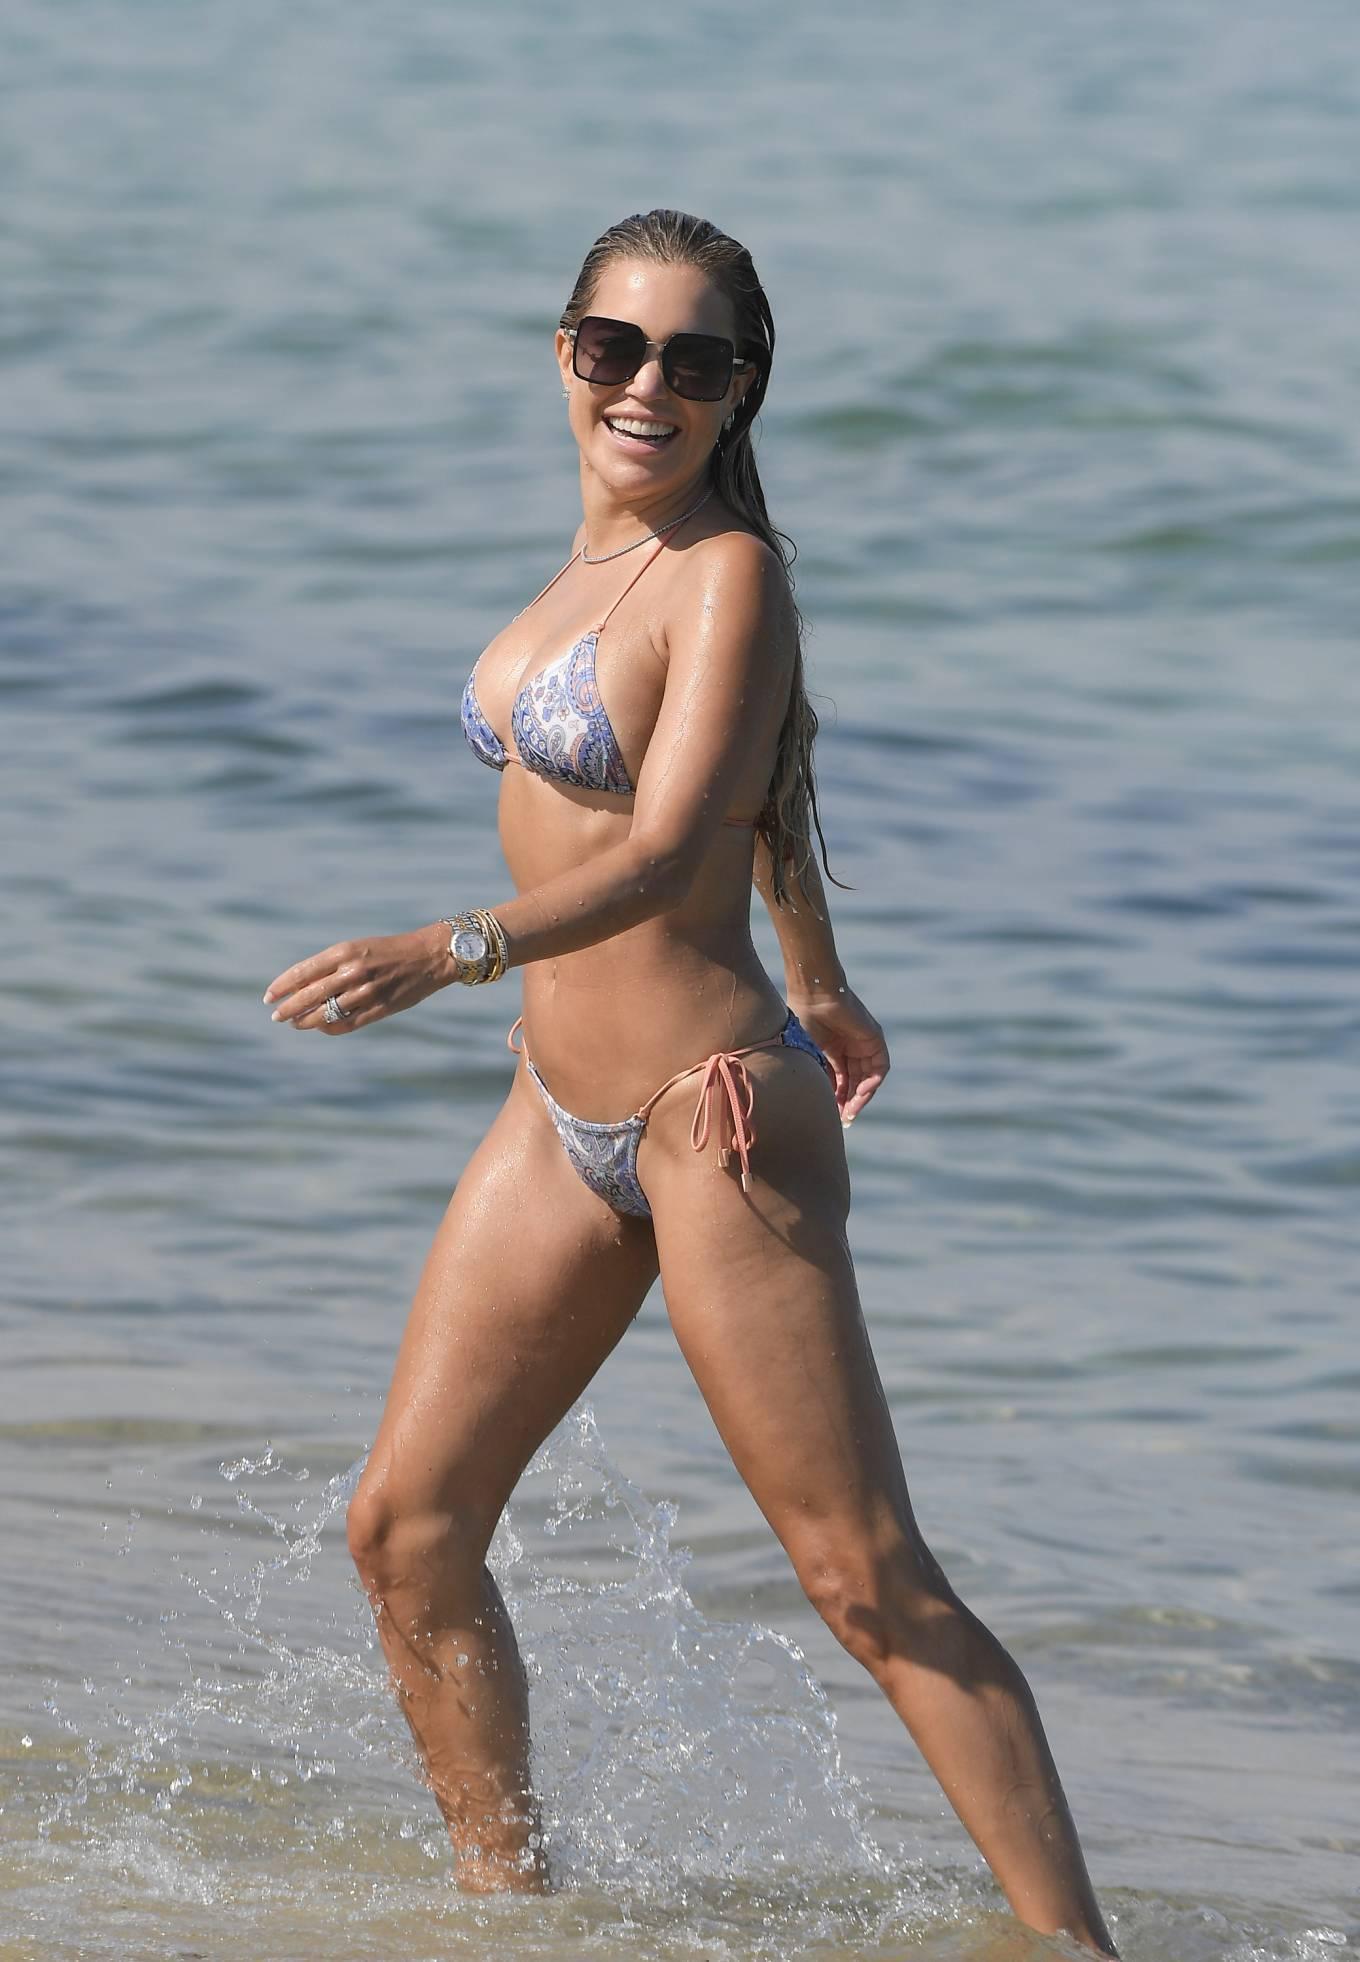 Sylvie Meis 2021 : Sylvie Meis – In a bikini with her husband Niclas Castello on the beach La Réserve in Ramatuelle-15